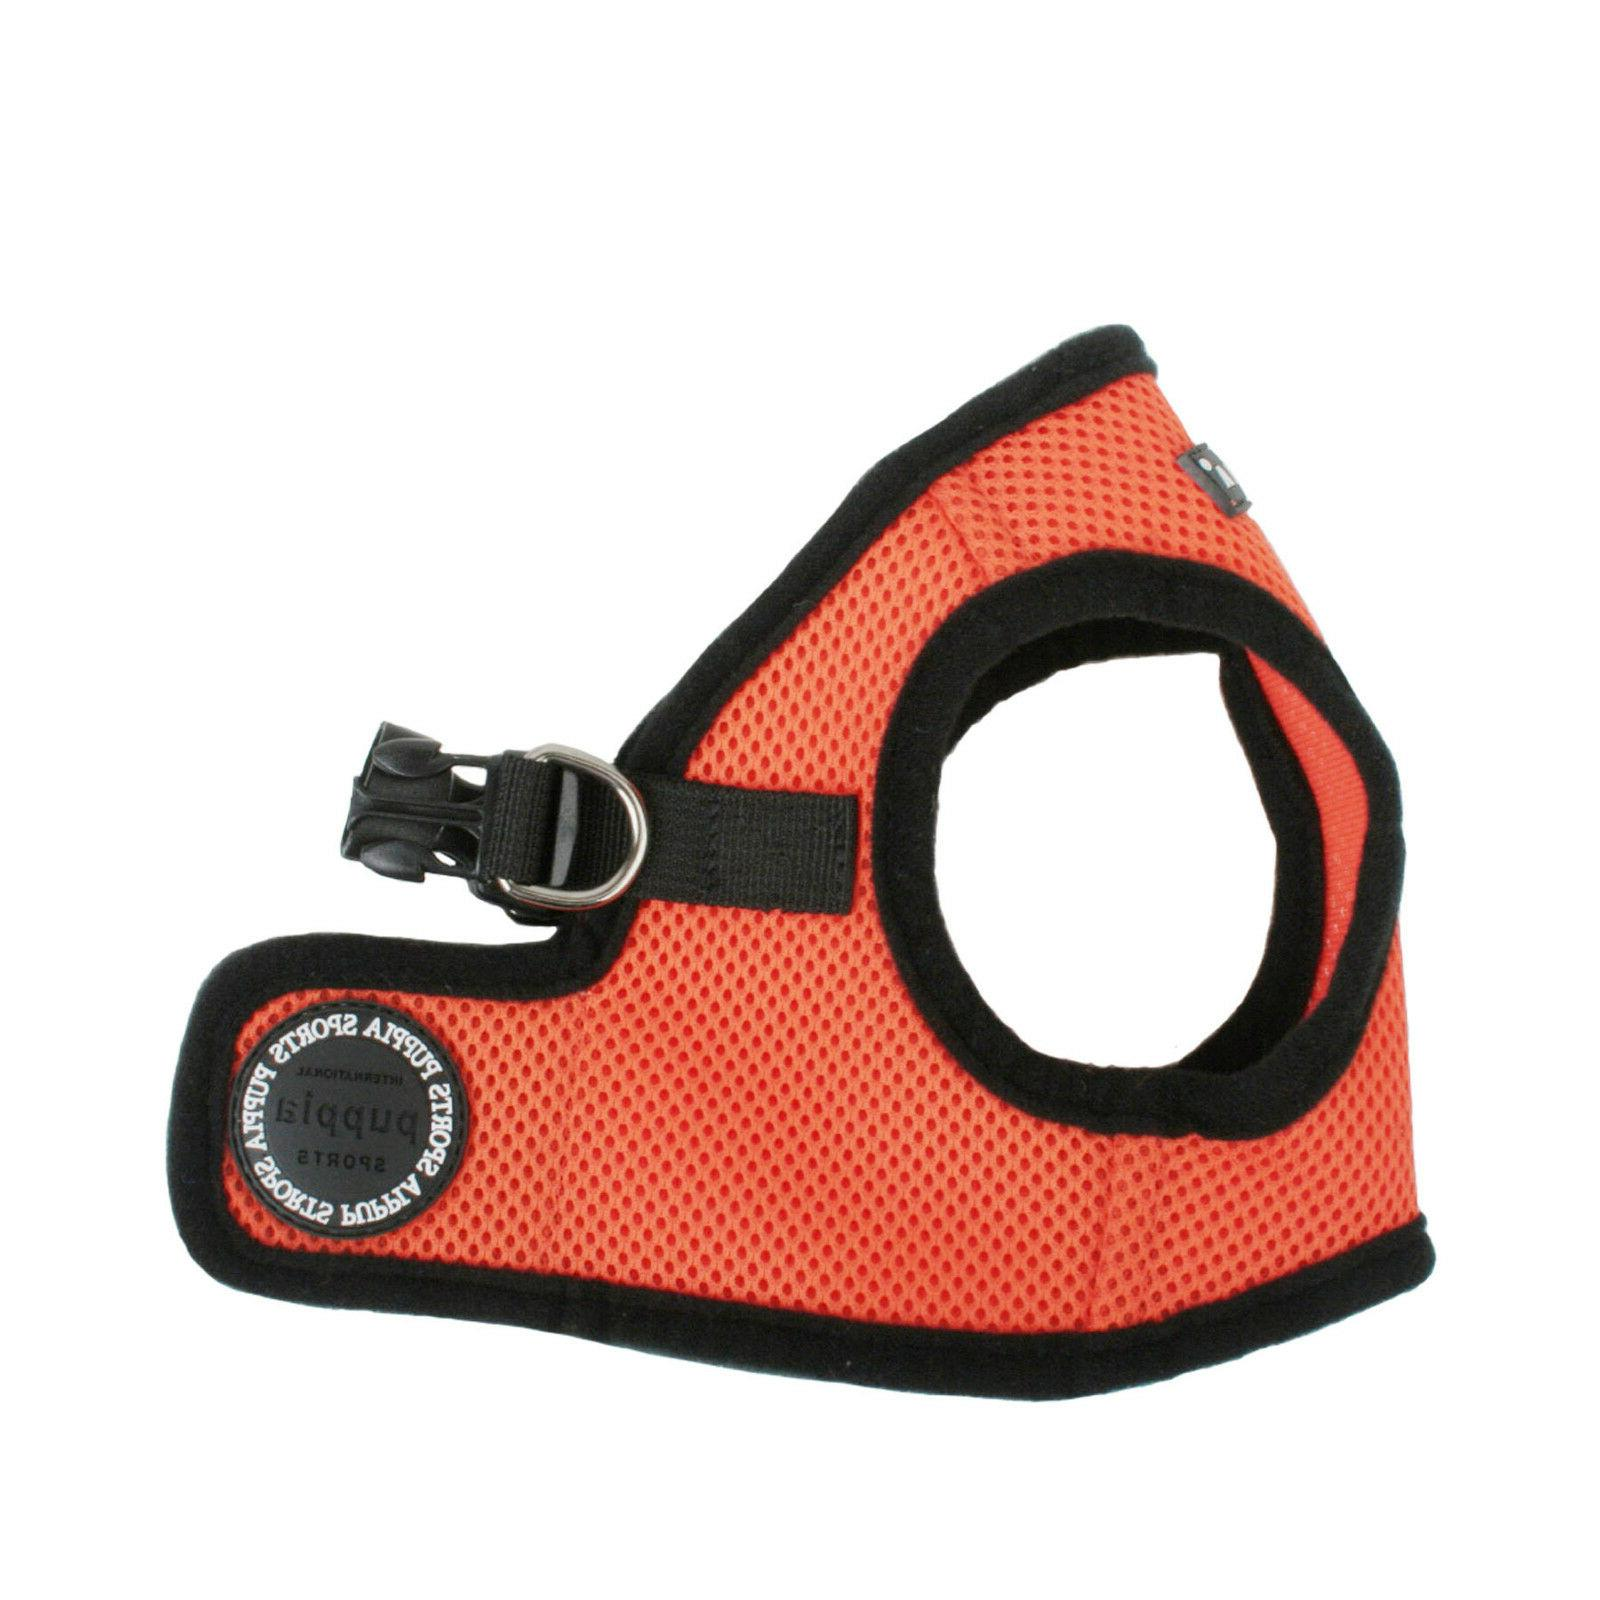 Puppia® - Adjust. Breathable Dog Harness - XL, AH305